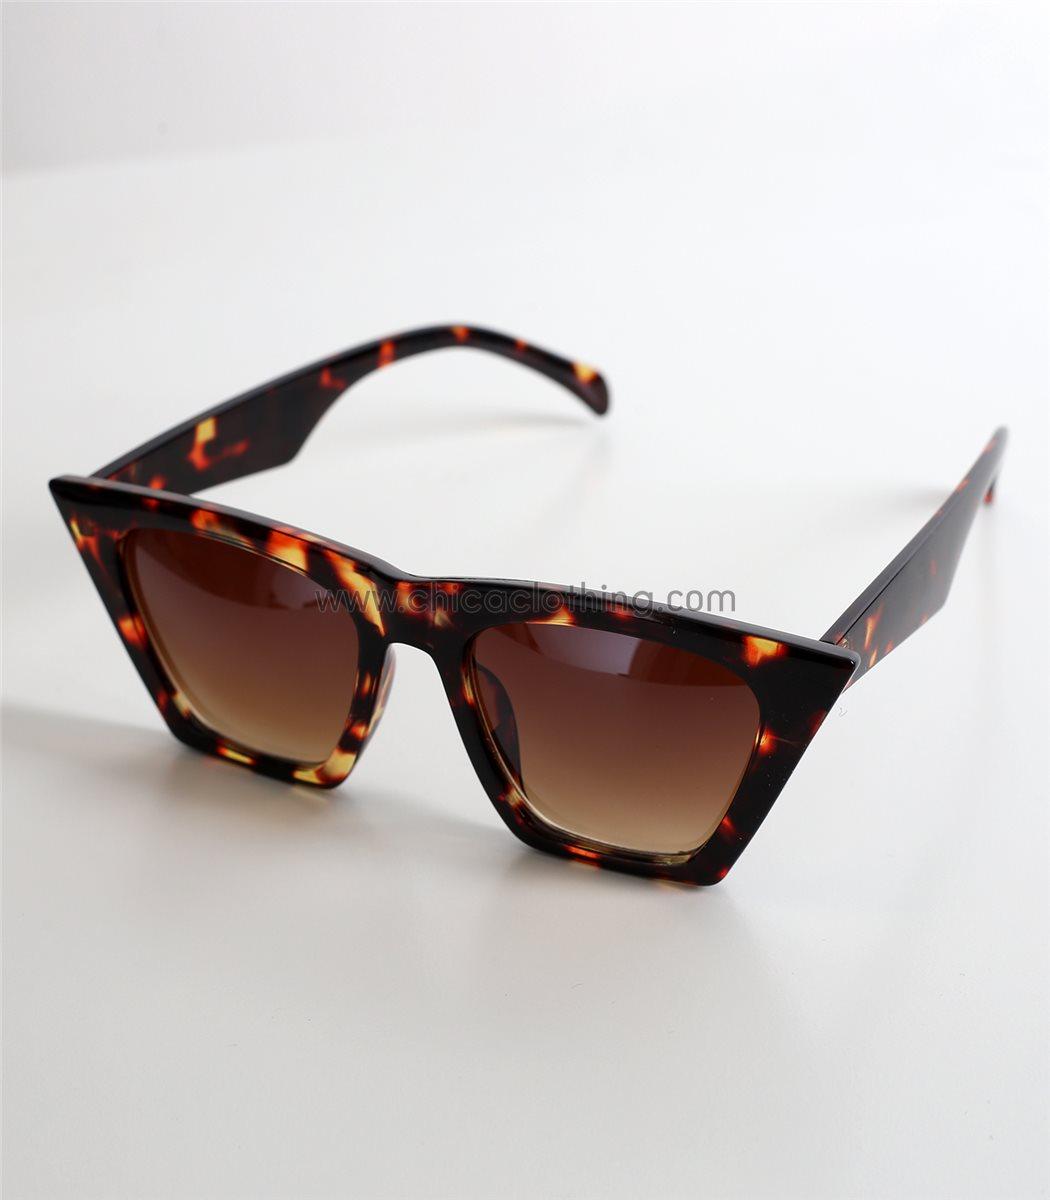 a3bed89609 Γυναικεία καφέ γυαλιά ηλίου μάσκα με ταρταρούγα σκελετό